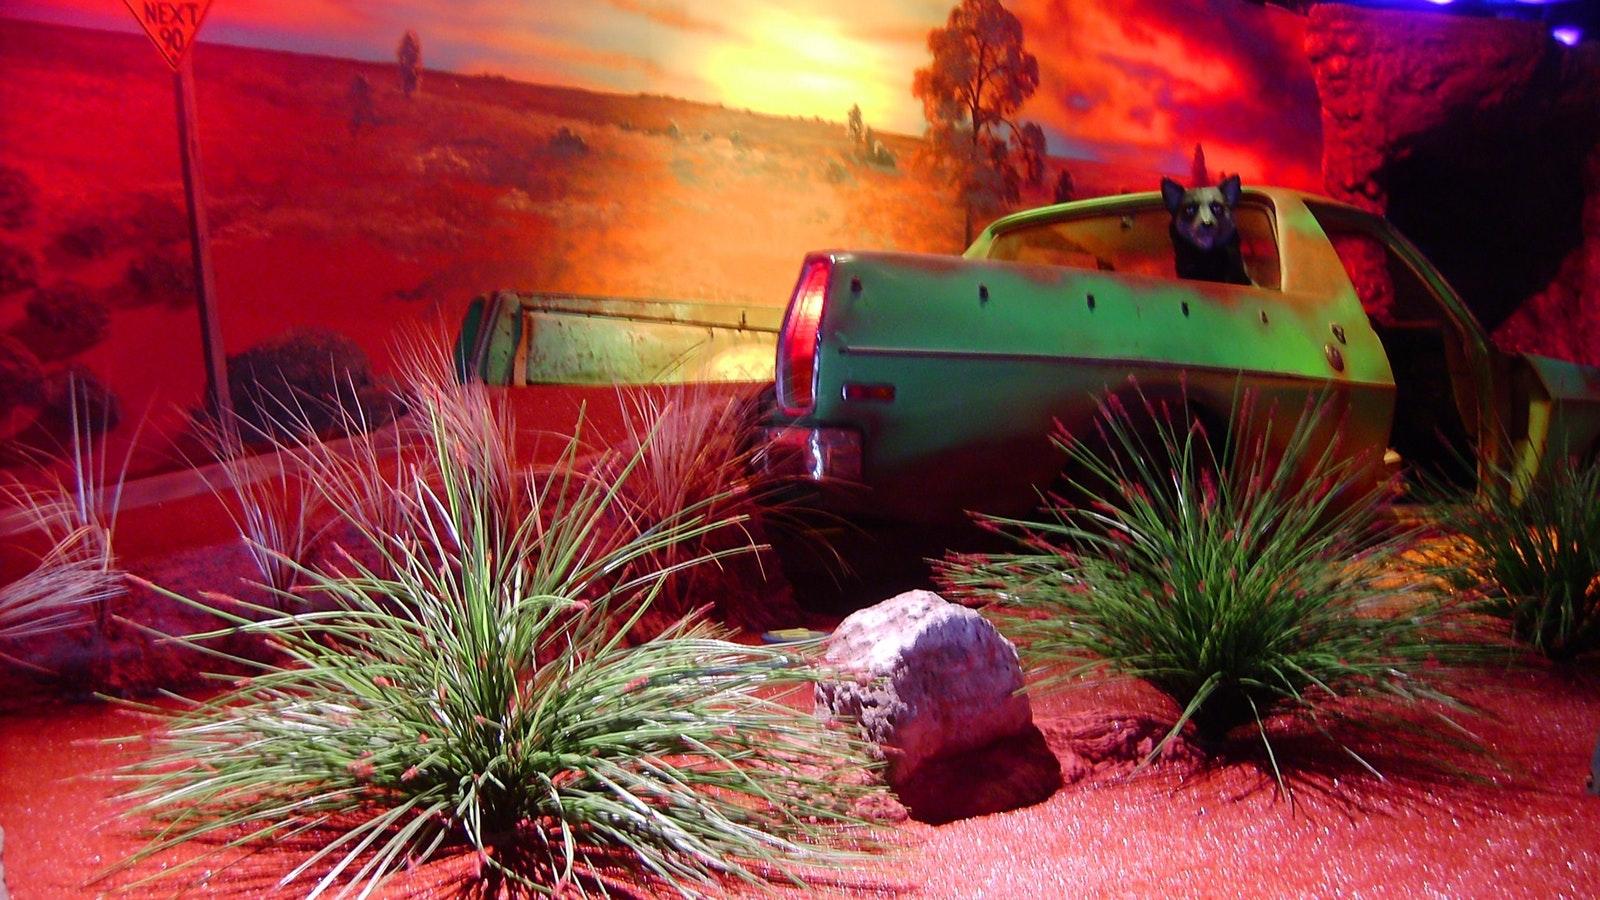 The Outback Australia minigolf